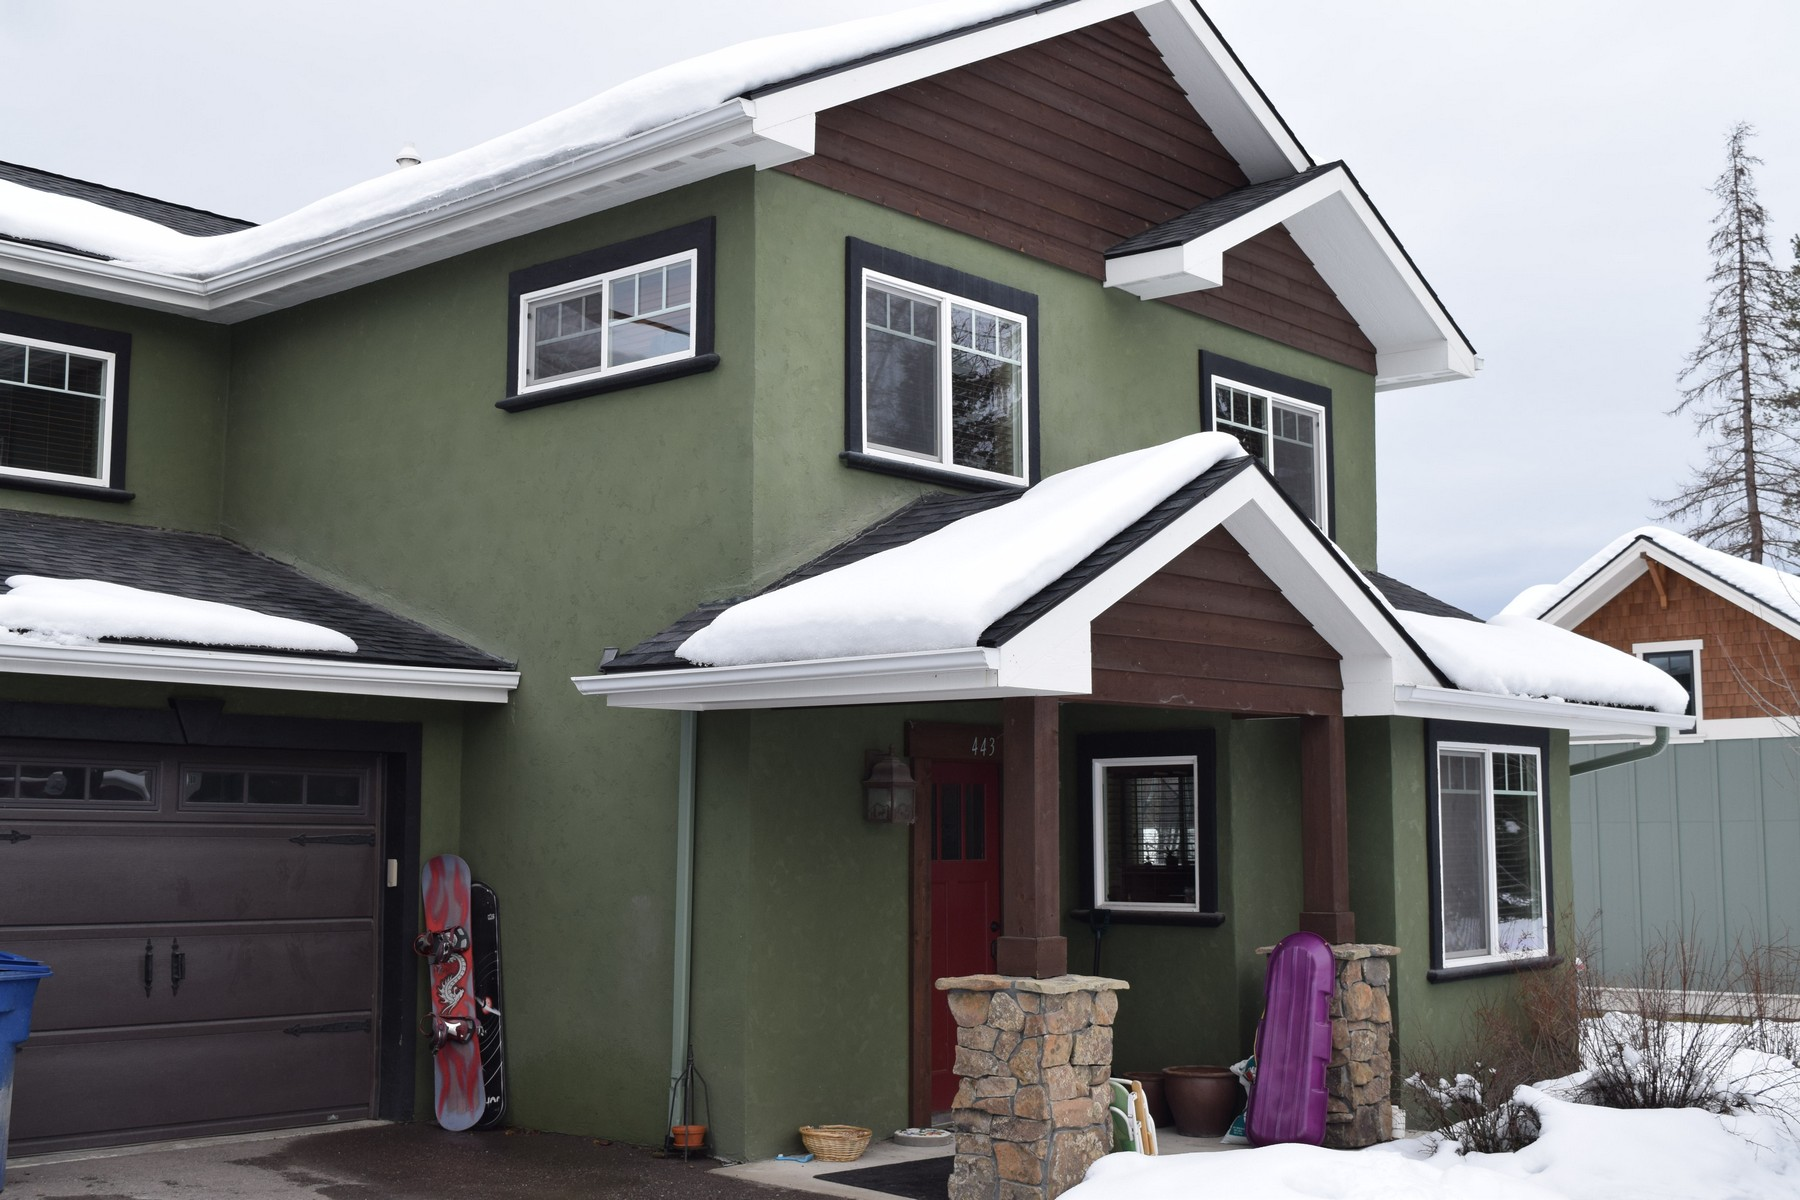 Villetta a schiera per Vendita alle ore Karrow Townhouses 441 Karrow Avenue Whitefish, Montana, 59937 Stati Uniti